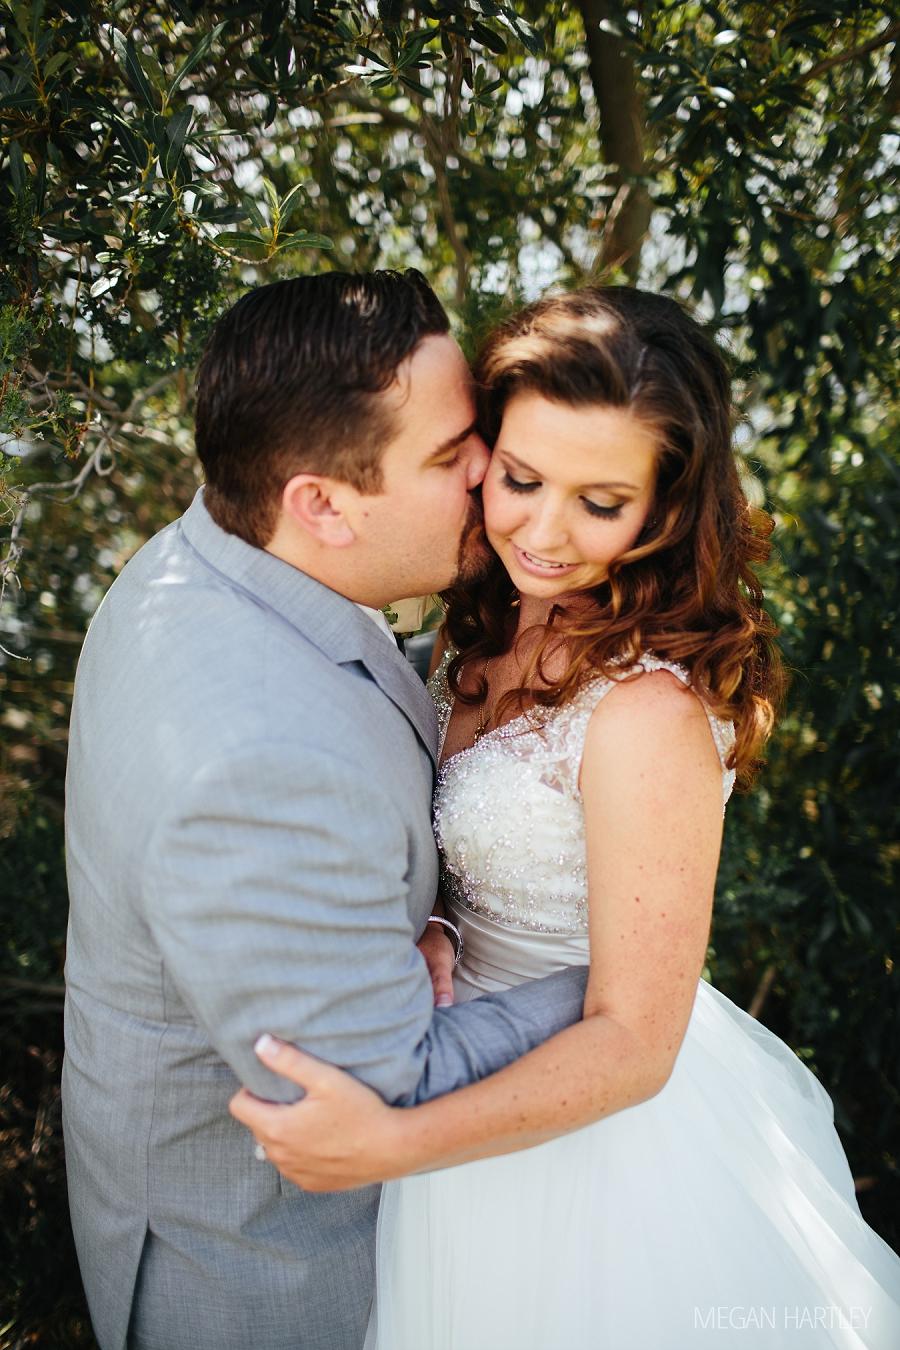 Megan Hartley Photography Palos Verdes Norris Center Wedding Photographer 00015